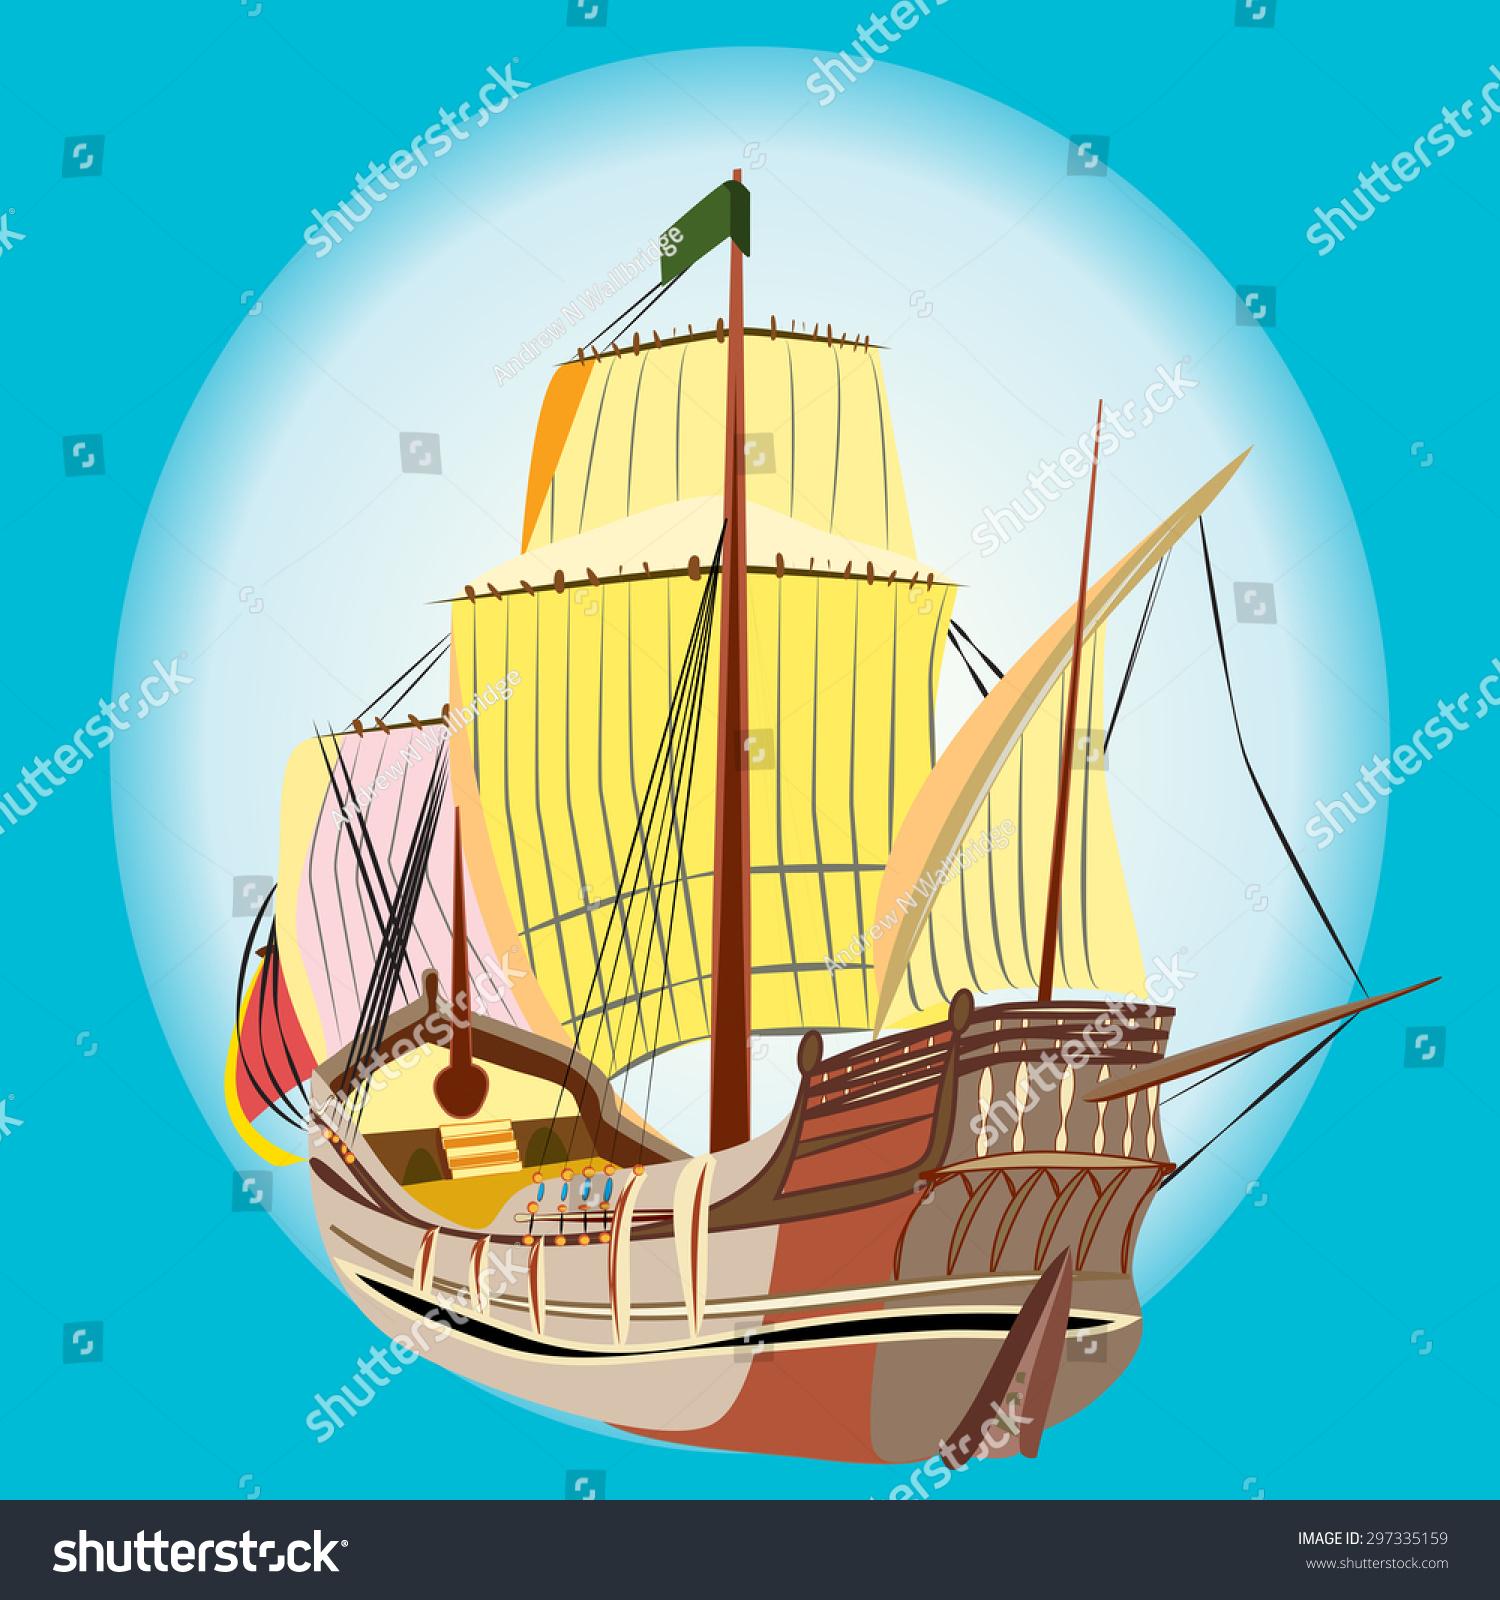 Vector Illustration Old Wooden Sailing Ship Stock Vector Royalty